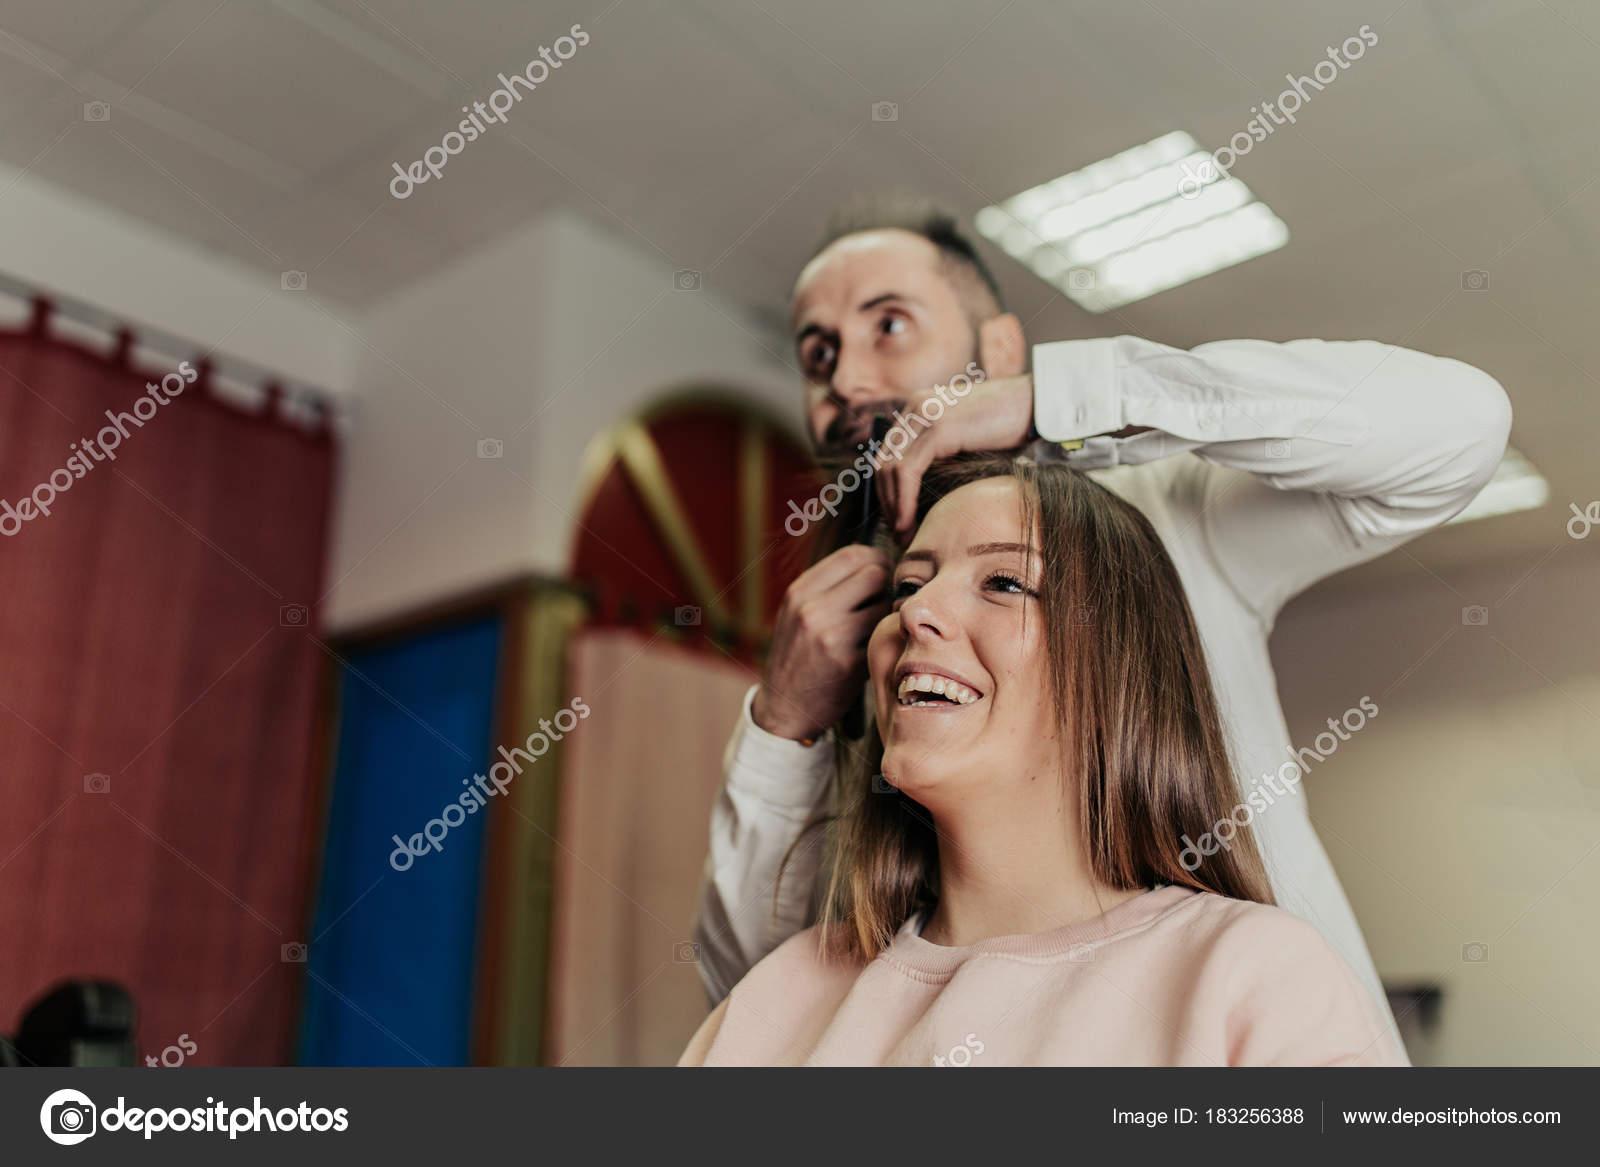 Junge Frau Bekommt Neue Frisur Beim Friseur Beauty Salon Stockfoto